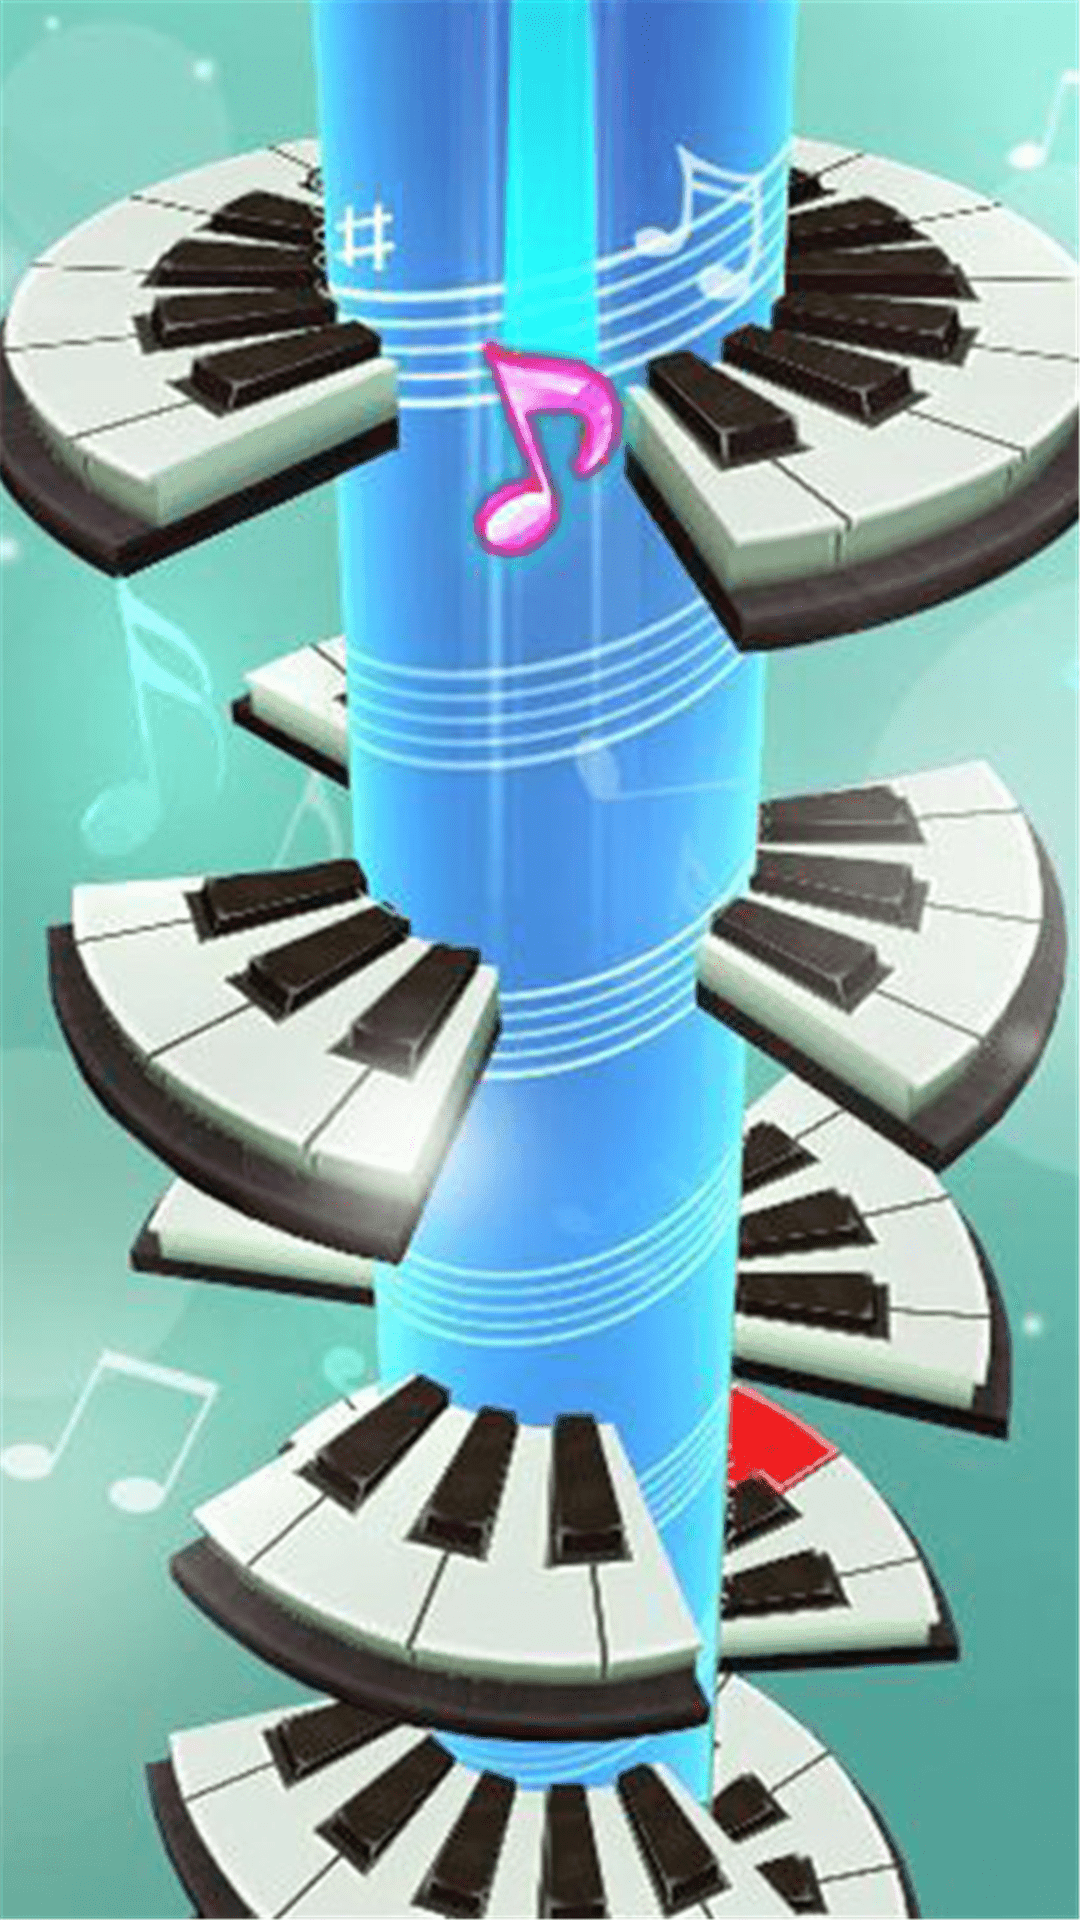 钢琴(4) onerror=